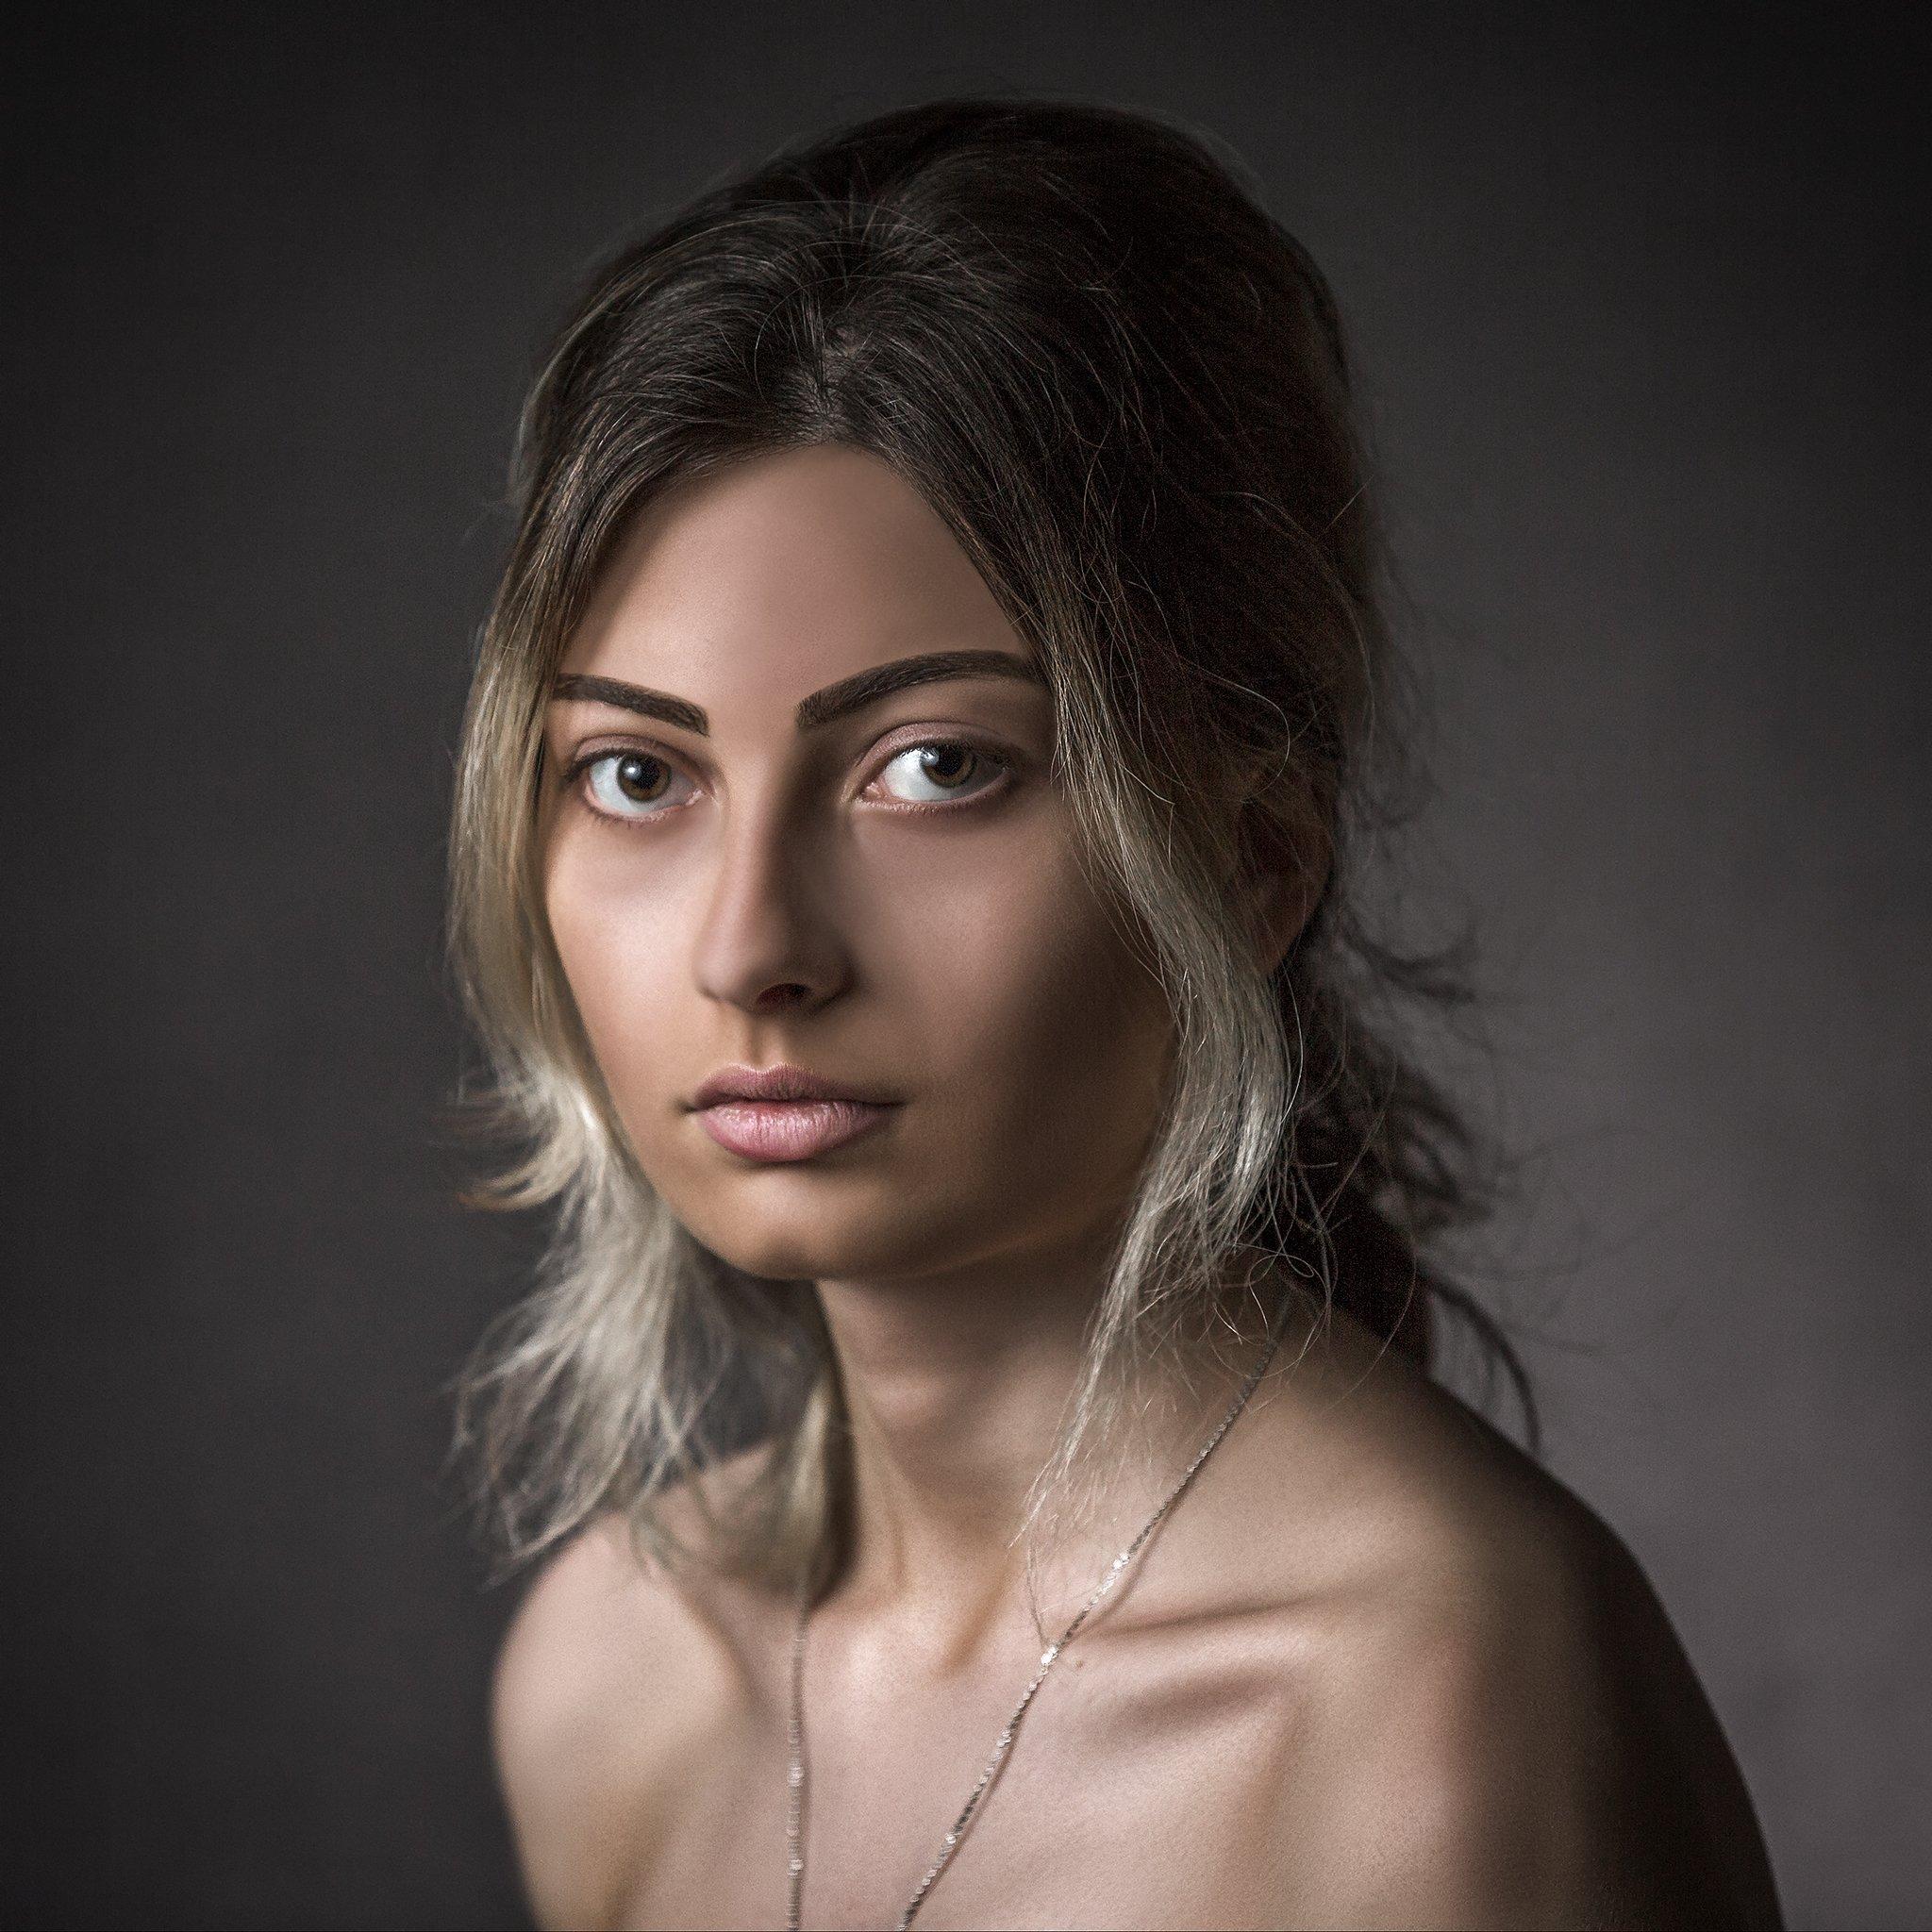 portrait janre women , ნიკოლოზ მესხი